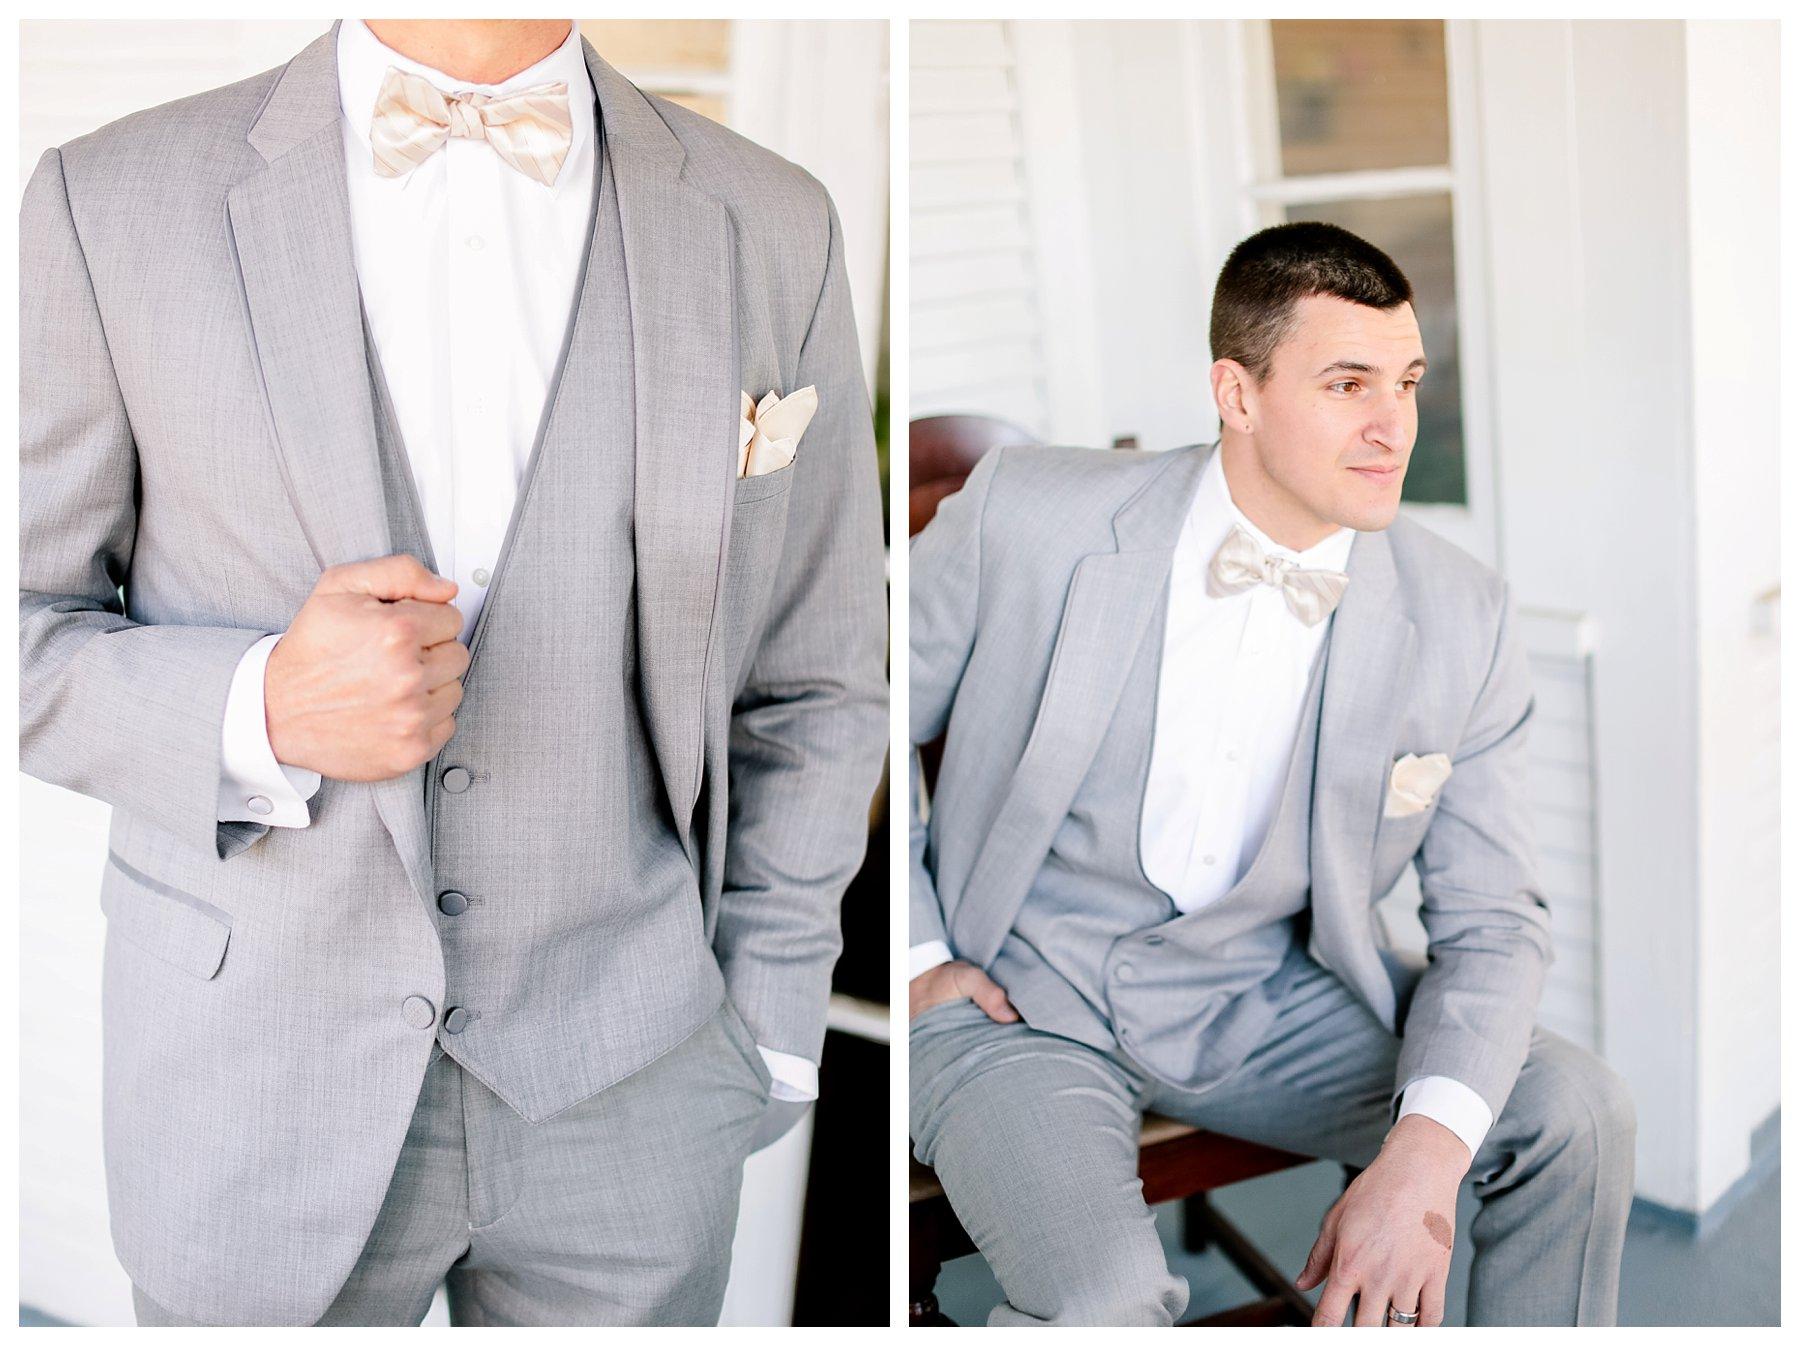 photographer_wedding_saint_louis_Kansas_City_Photography_Videography_workshop_training_styled_engagement_Lake_Ozark_KC_MO_STL_Rolla_Hermann_Saint_James_0356.jpg